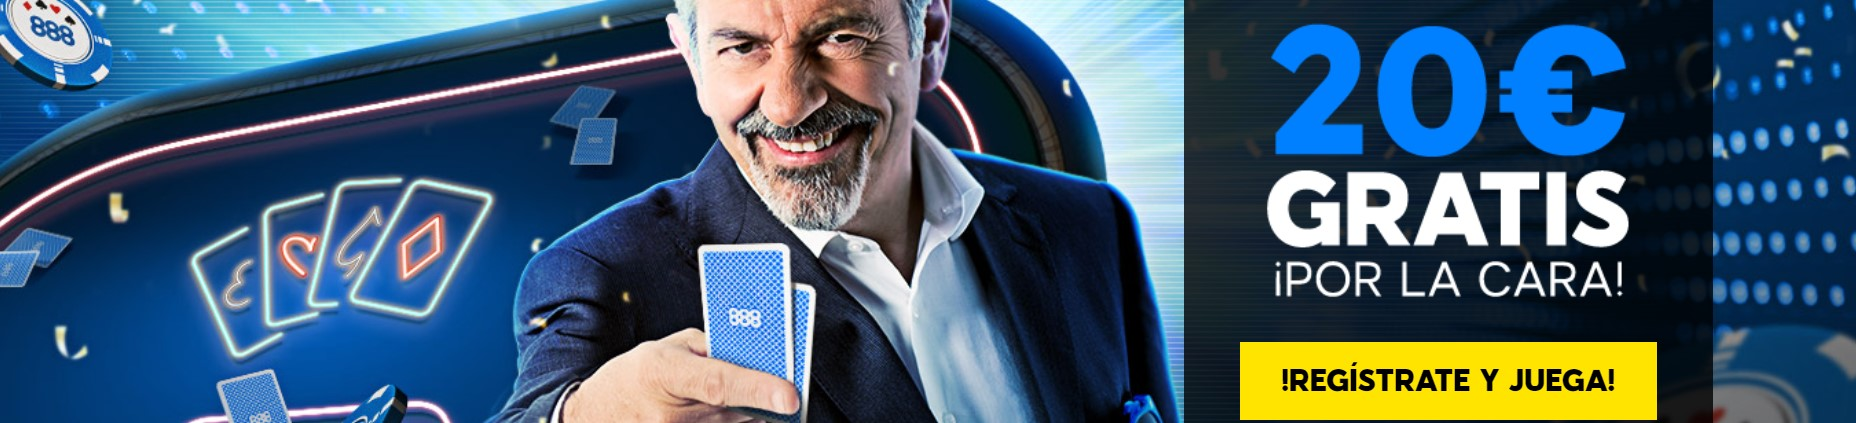 888 poker bono sin depósito poker